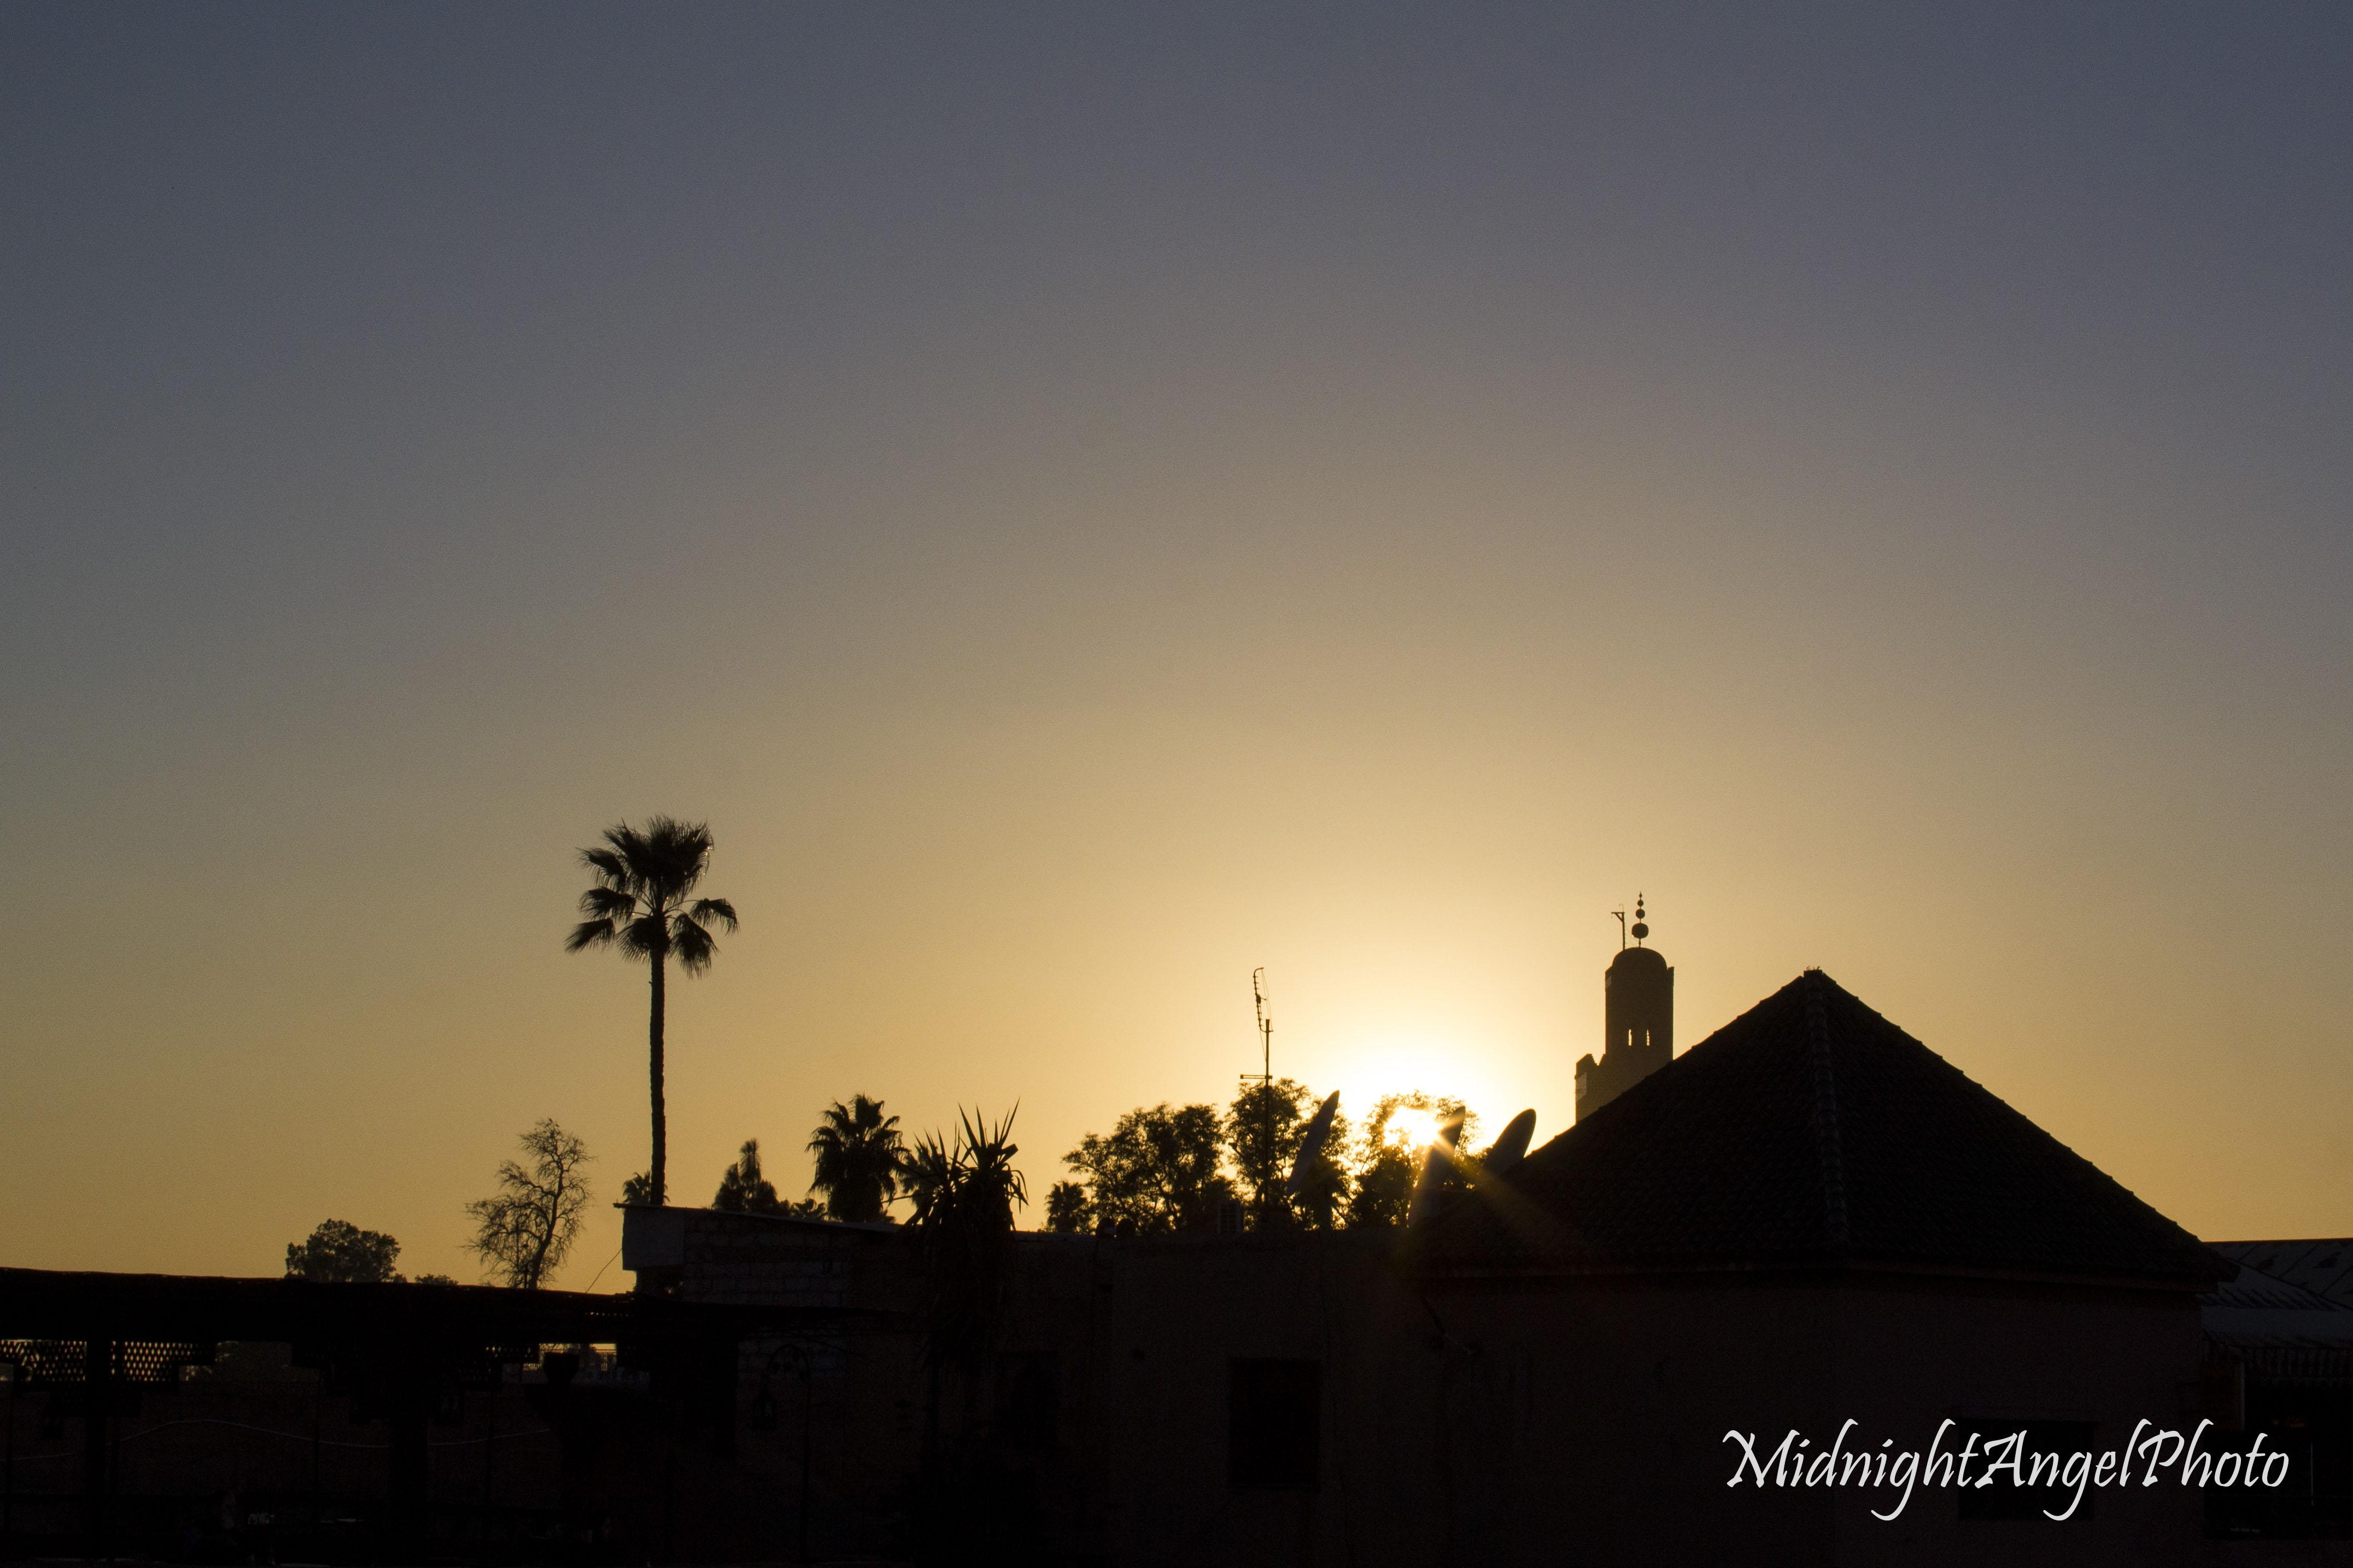 Sunset over Marrakesh, Morocco